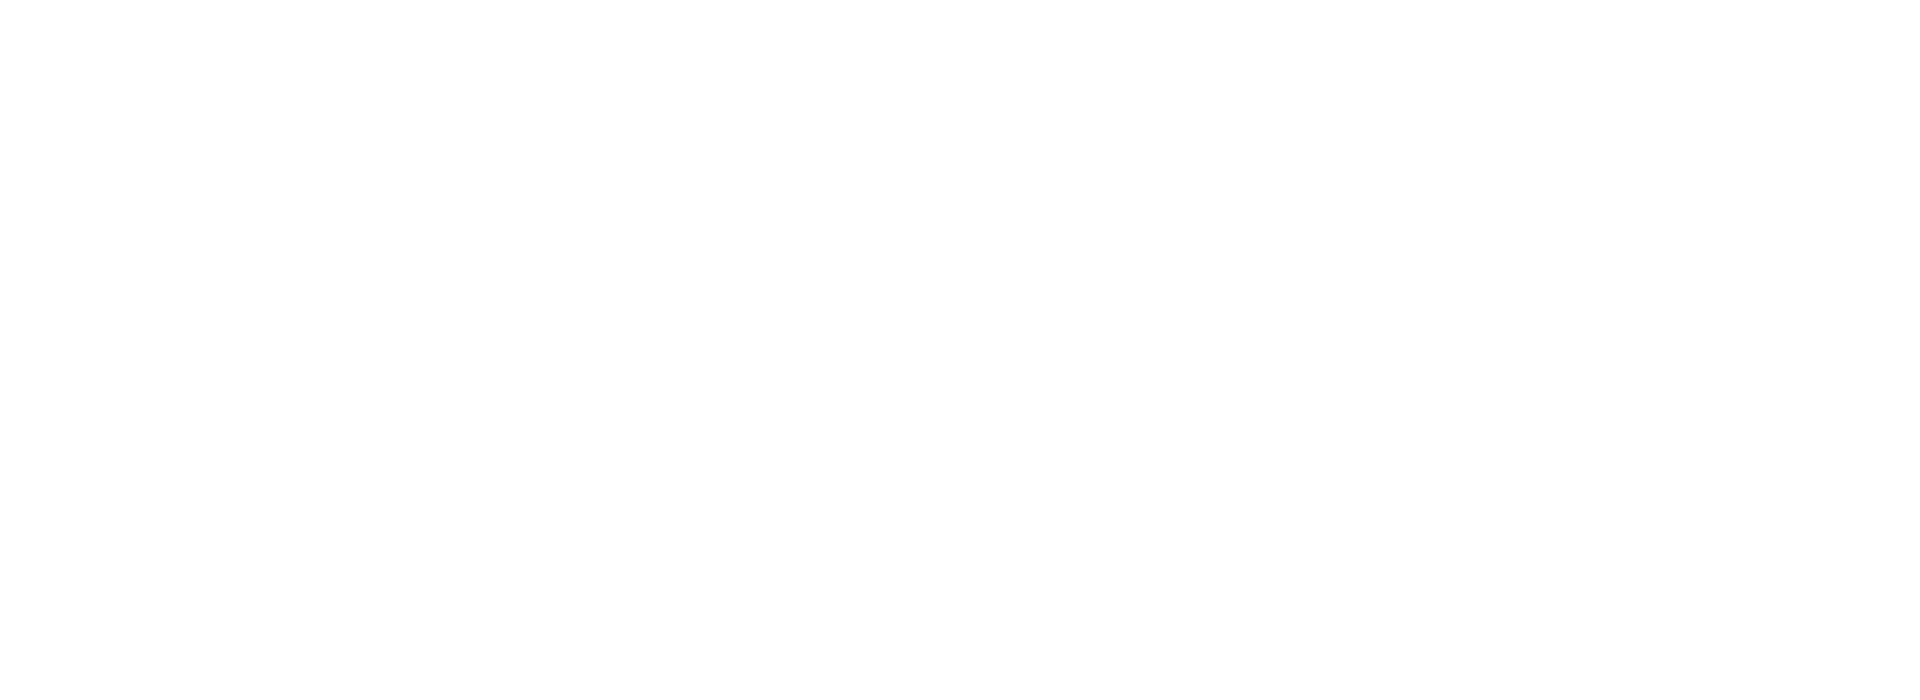 slider image text